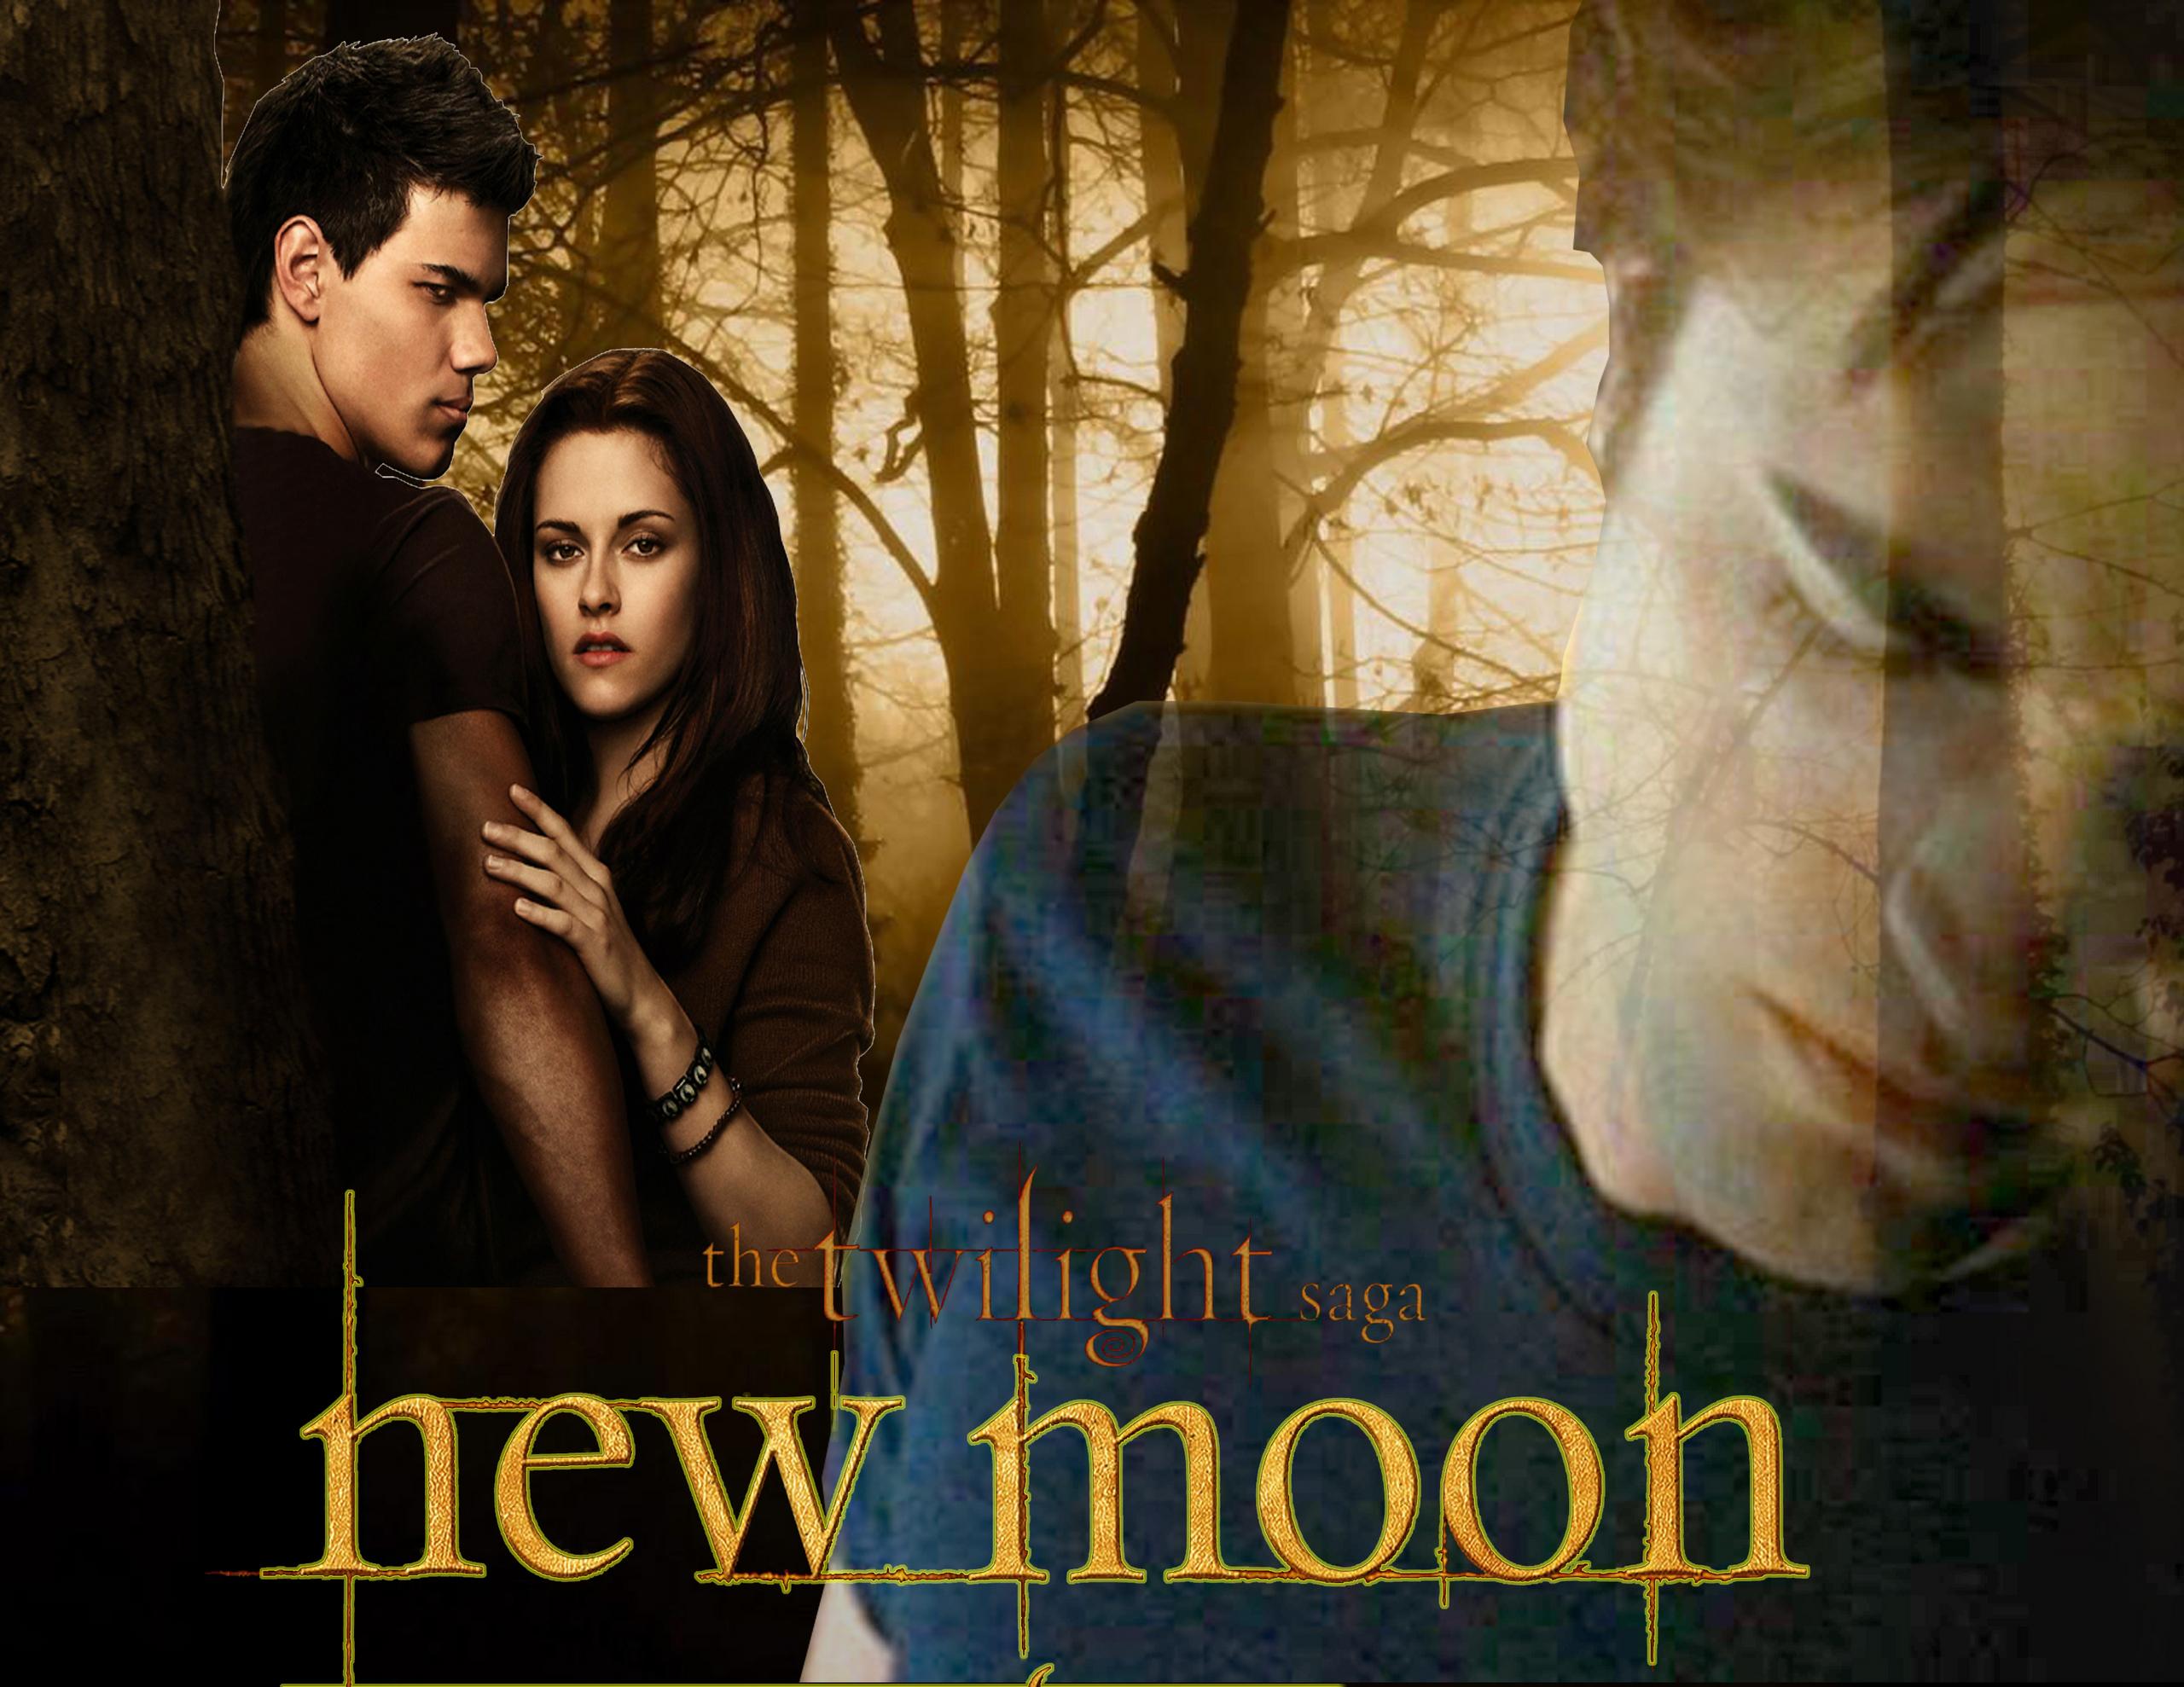 Twilight new moon wallpapers